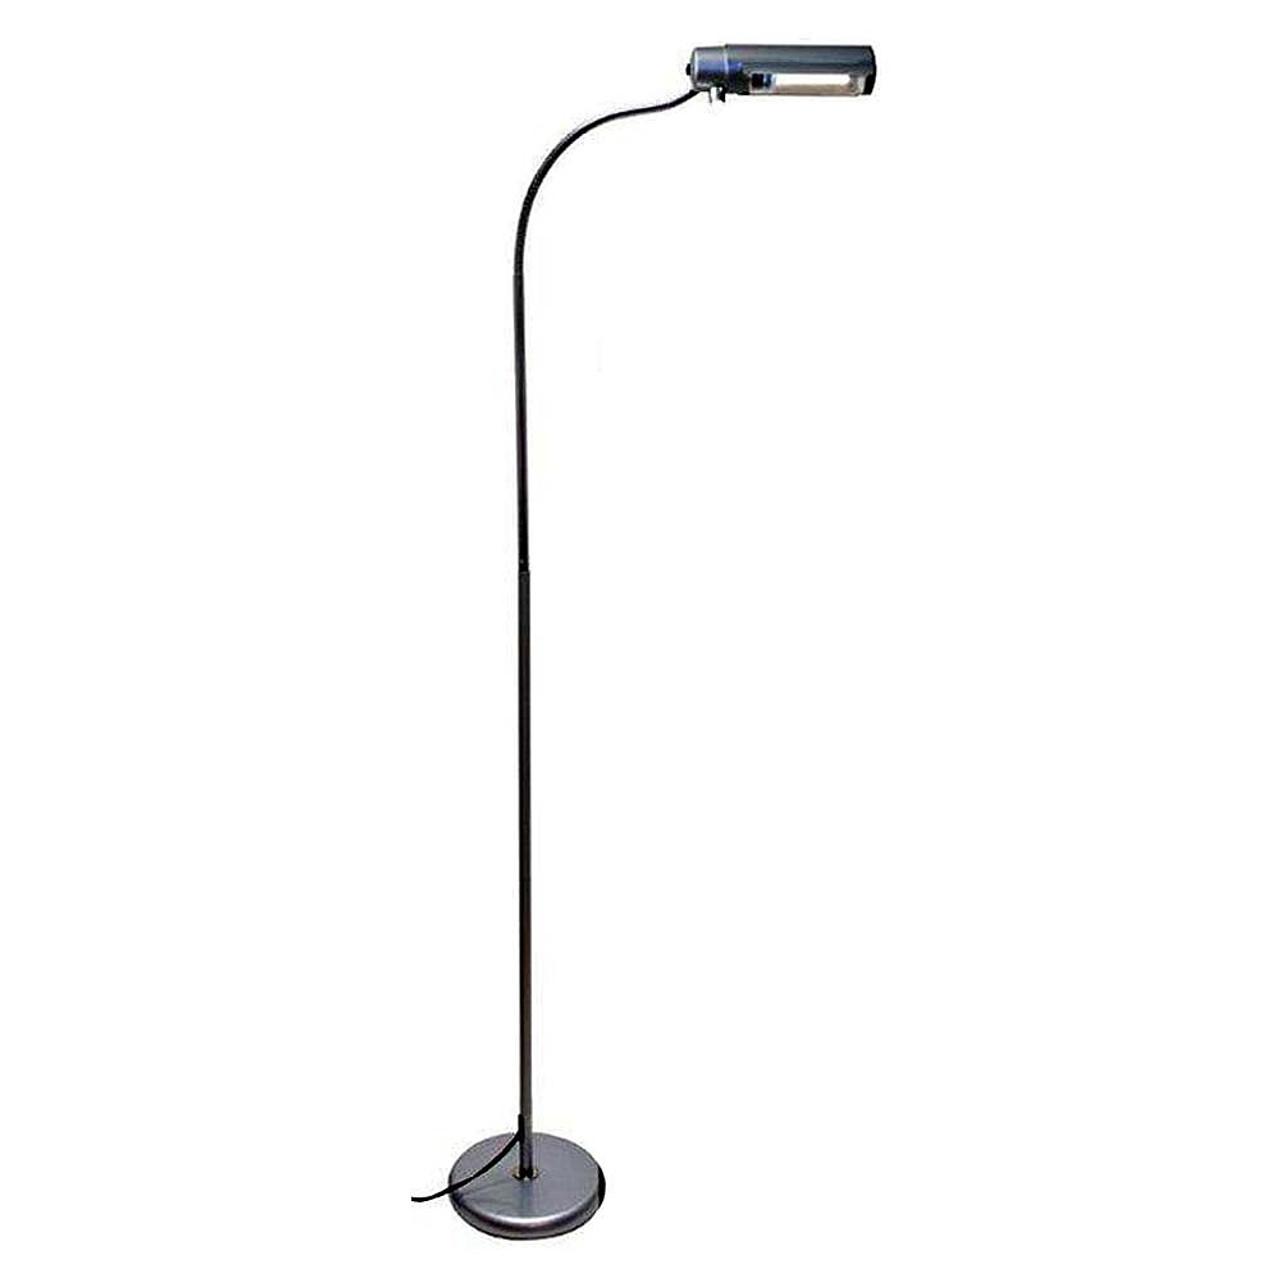 Avian Sun Deluxe Uv Floor Lamp Stand For Parrots No Bulb